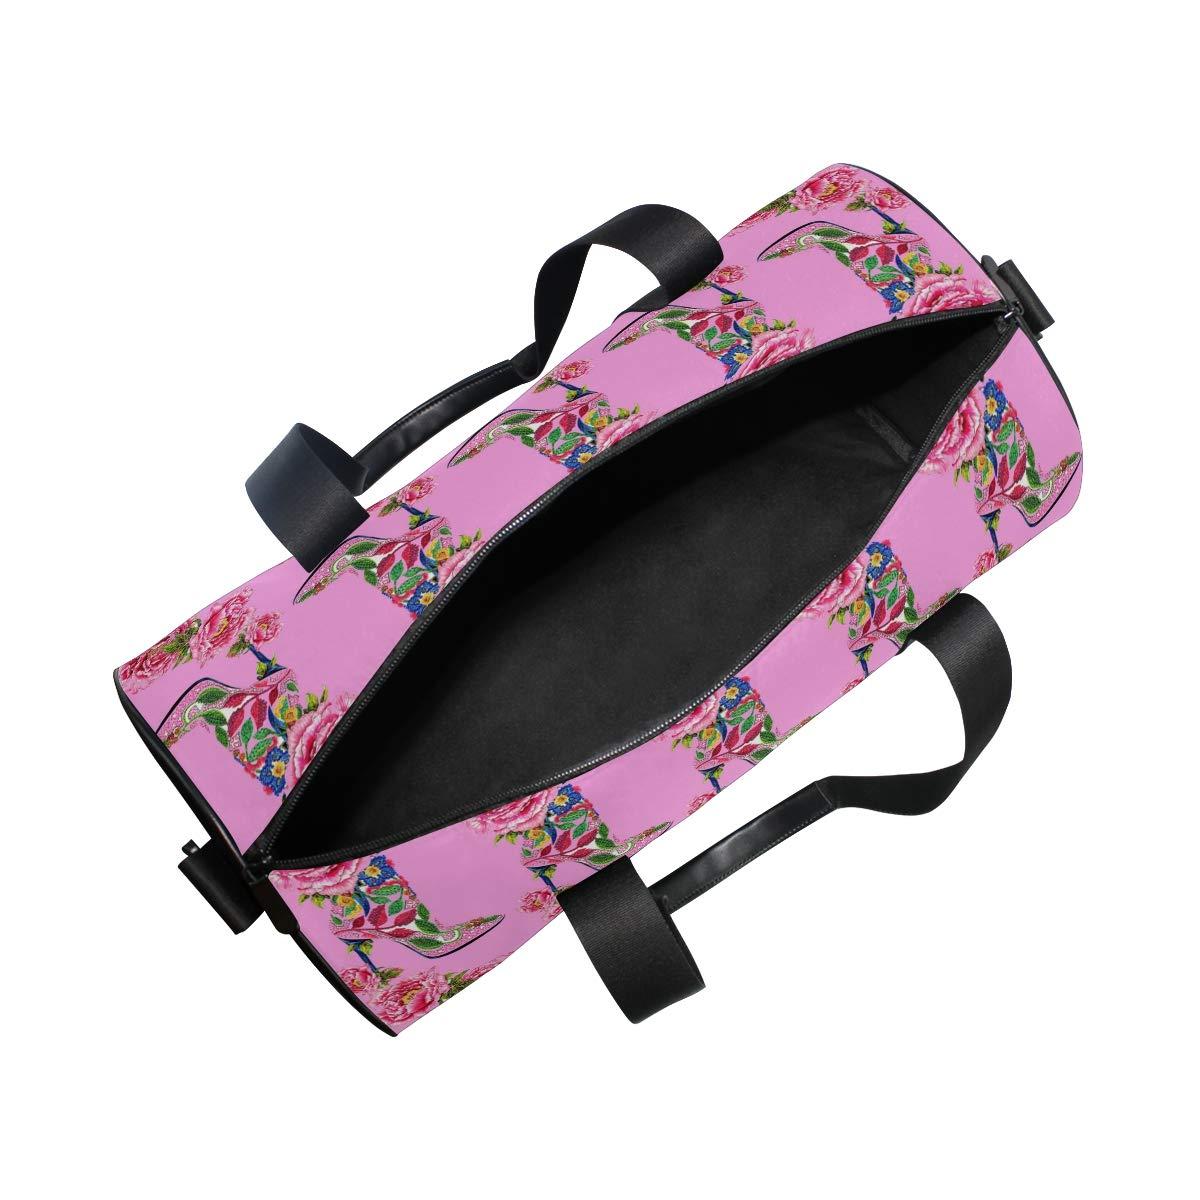 Sports Gym Duffel Barrel Bag High Heeled Shoes Shrubby Peony Pink Flower Travel Luggage Handbag for Men Women